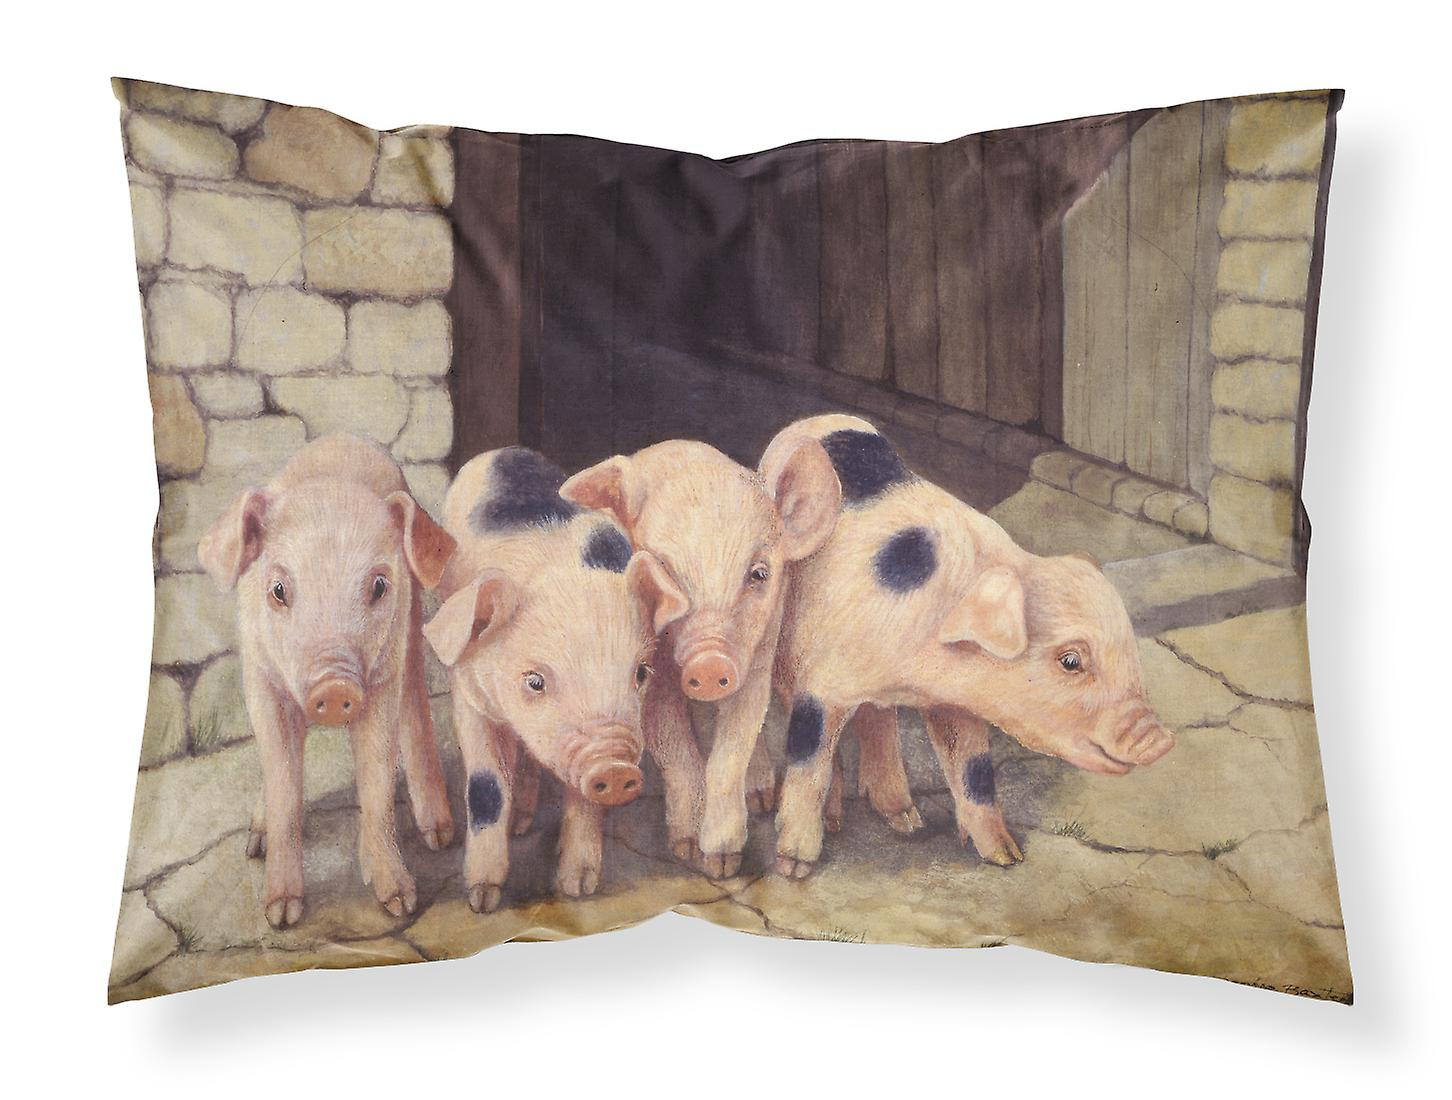 De Standard Baxter Porcelets Daphne Tissu D'oreiller Par Porcs Taie WDYIe9bEH2